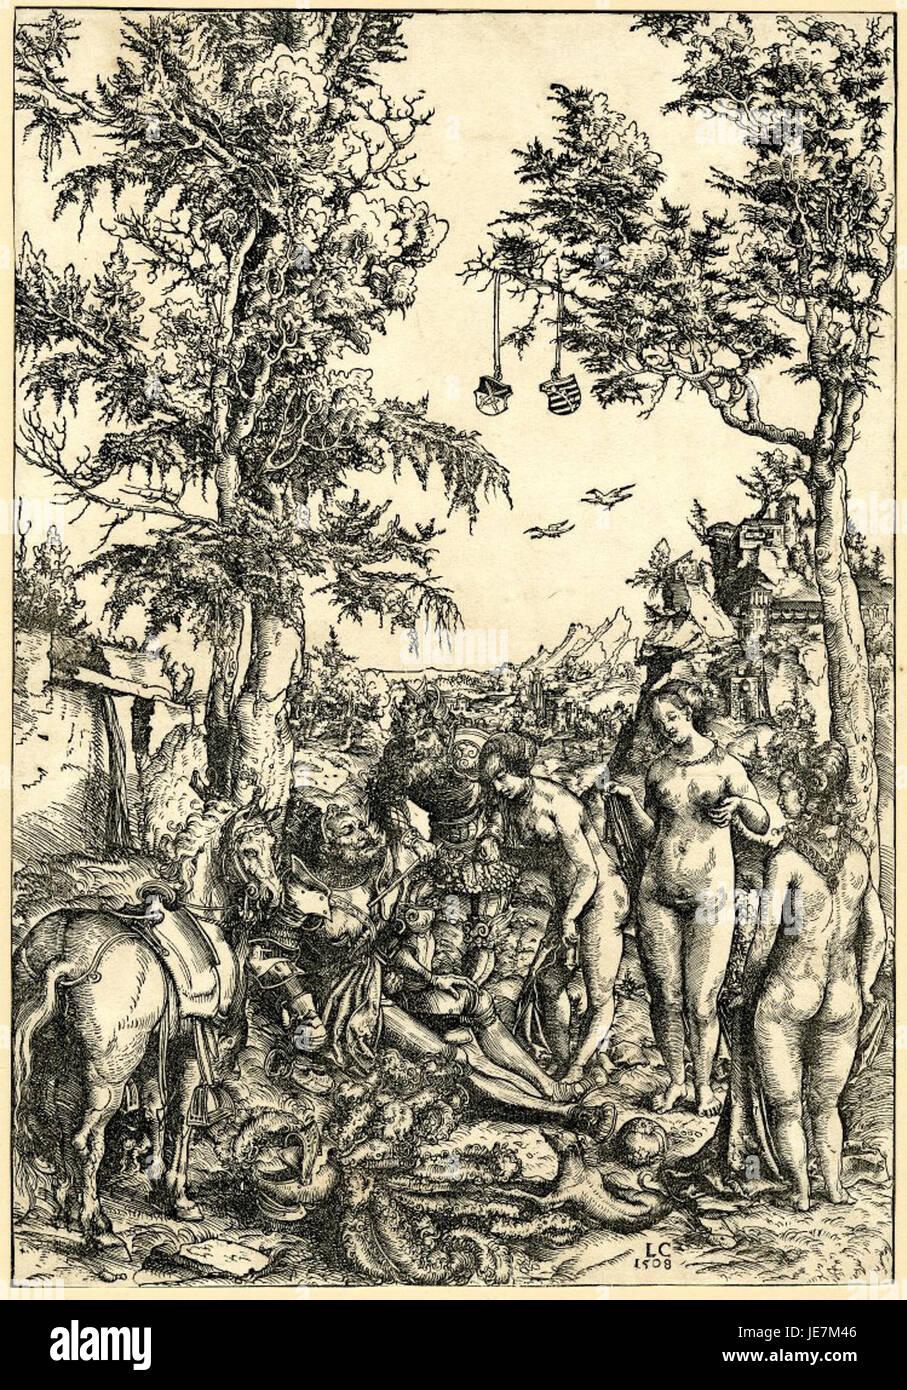 The Judgement of Paris by Lucas Cranach the Elder 1508 - Stock Image